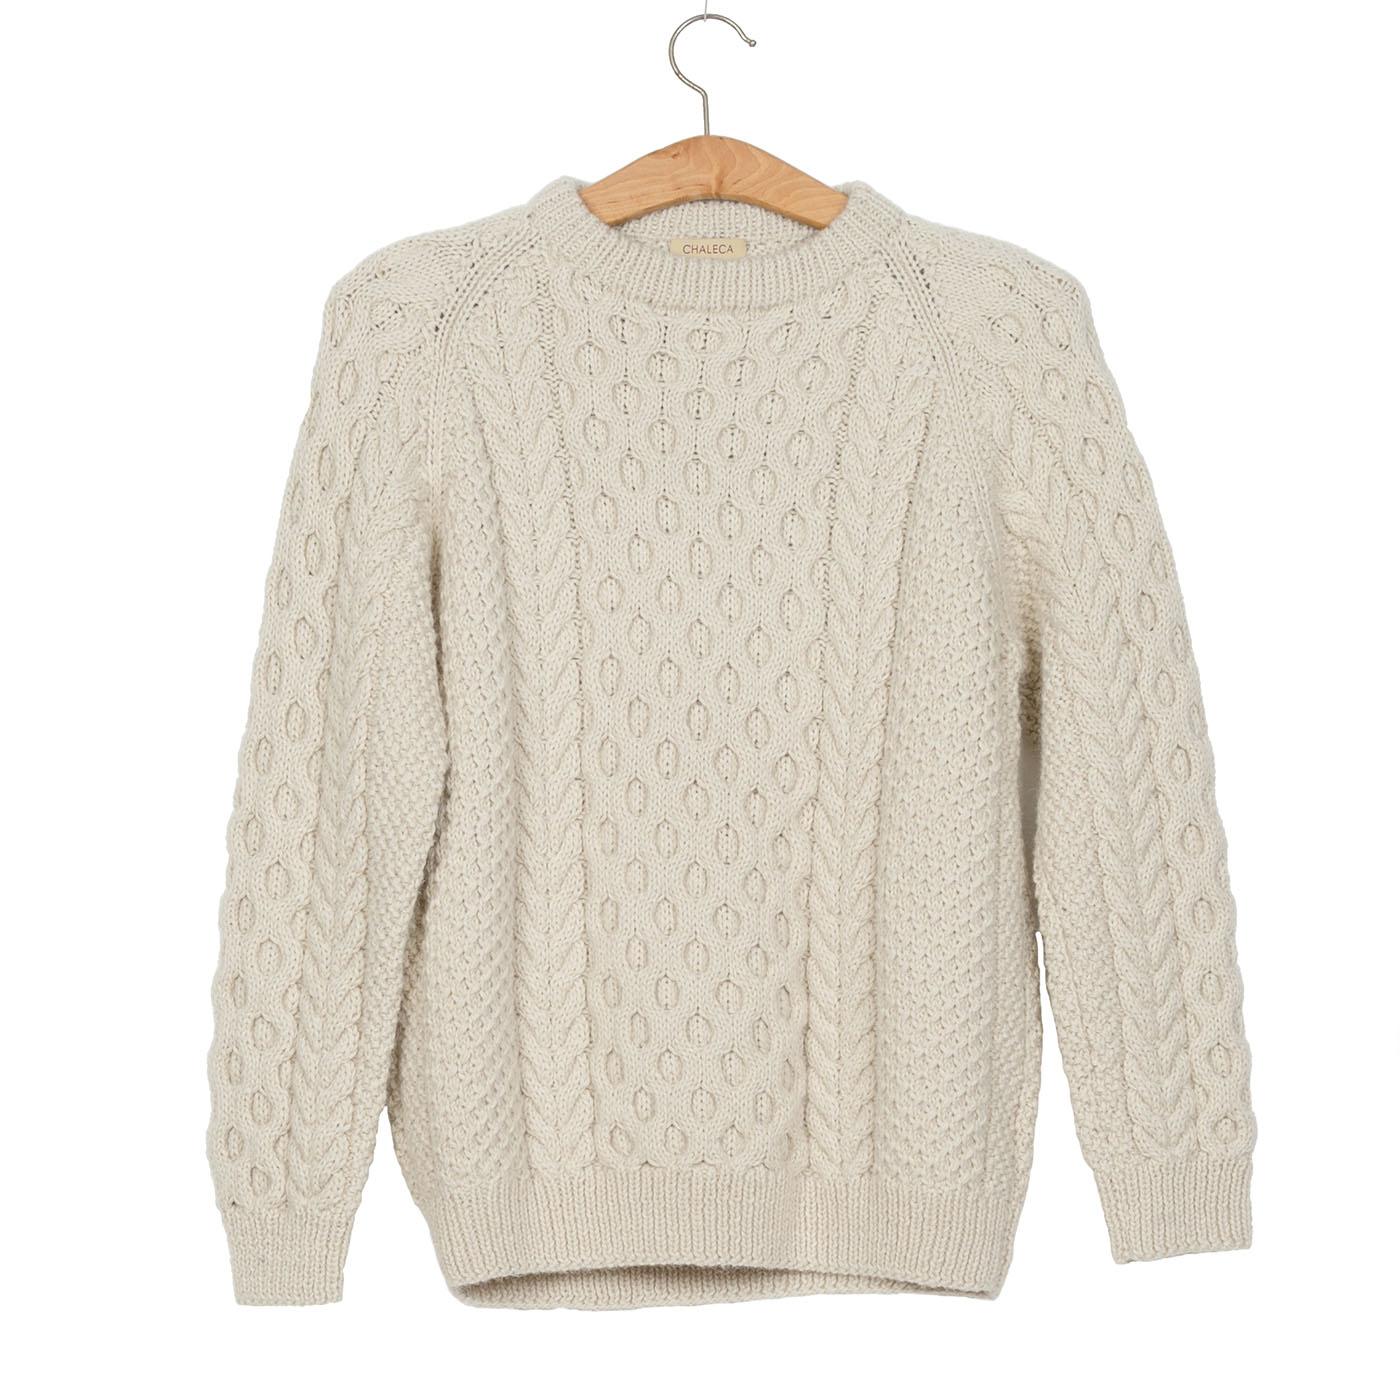 Tormenta Cable Knit Aran Sweater Natural White